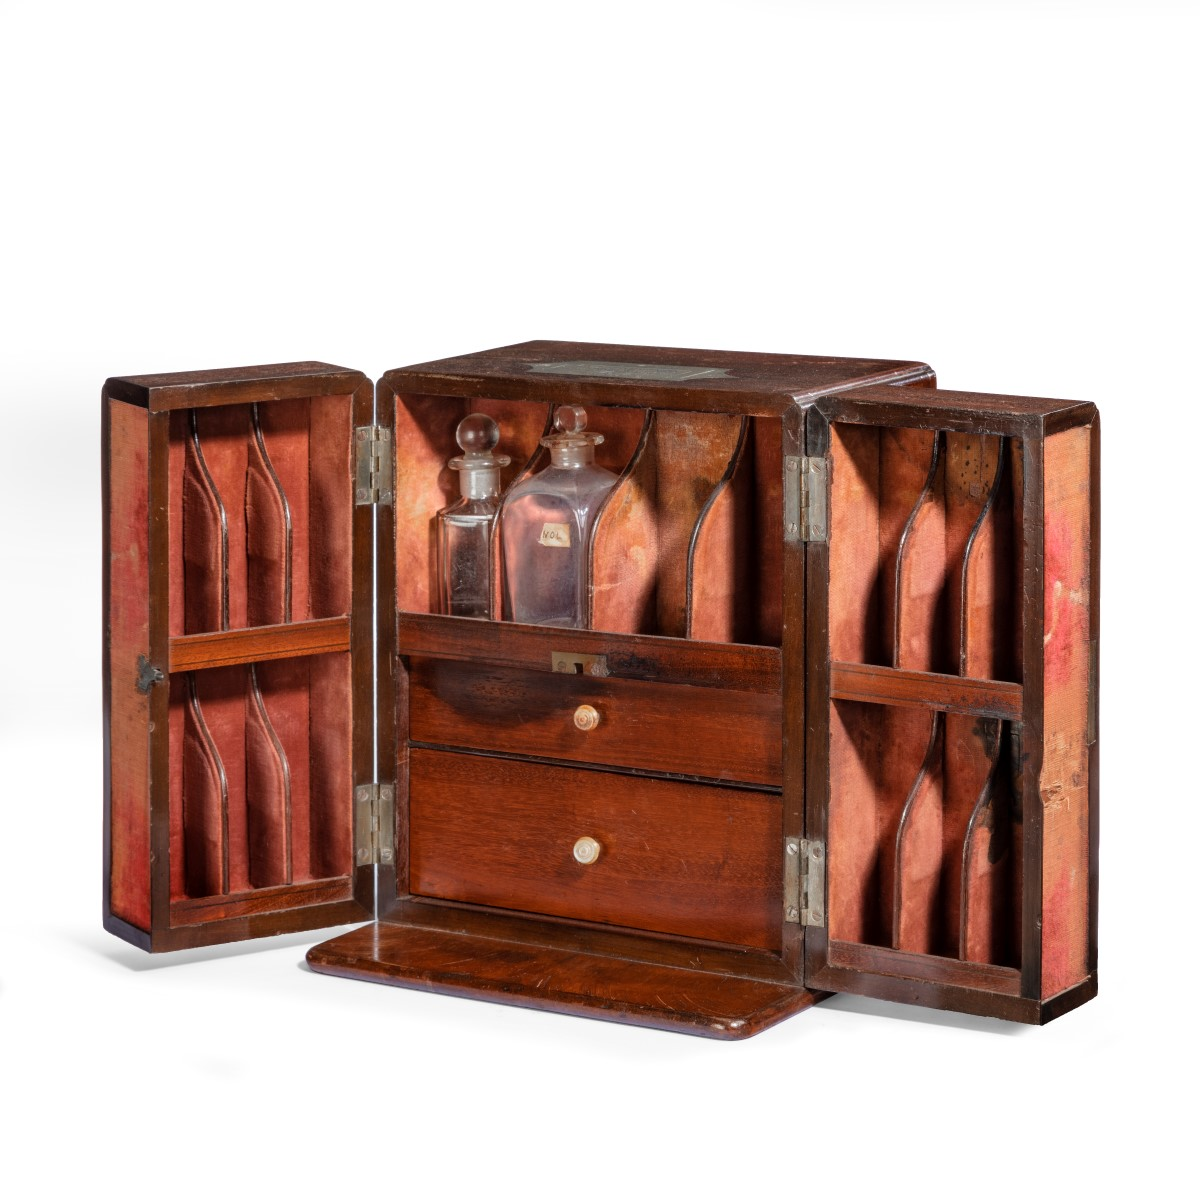 Surgeon Beatty's medicine chest, 1803